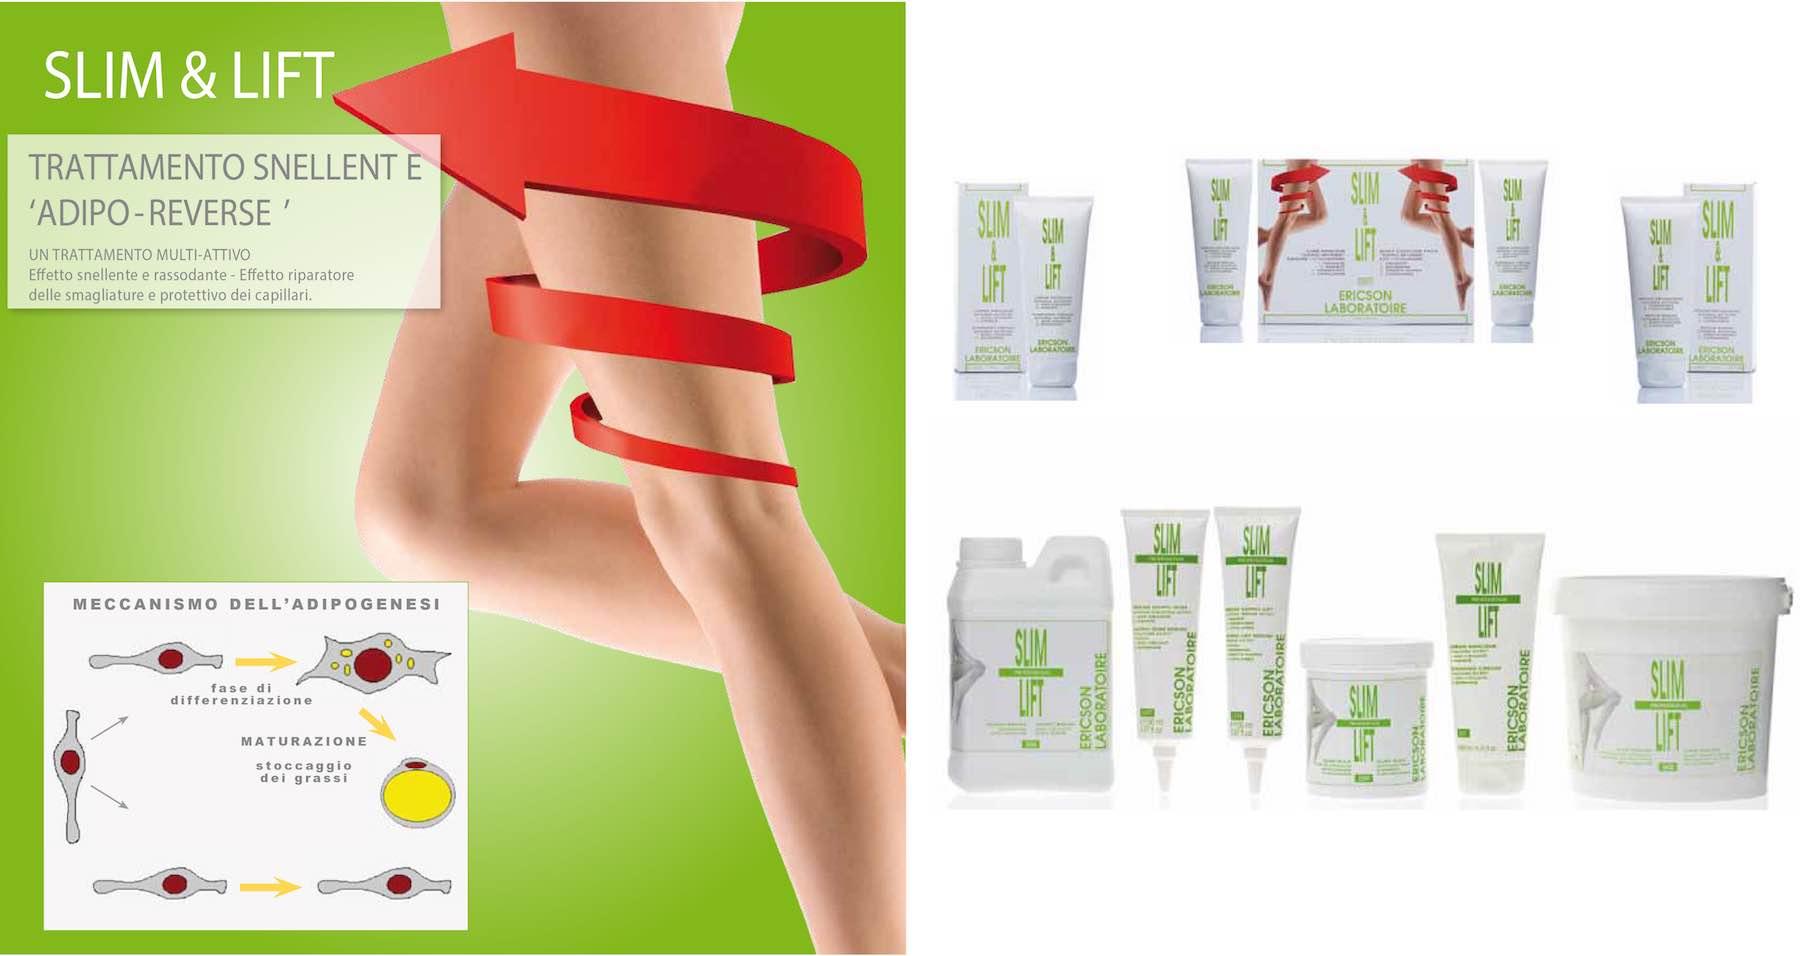 Jerà Beauty - Body - Ericson - Laboratoire-slim & lift